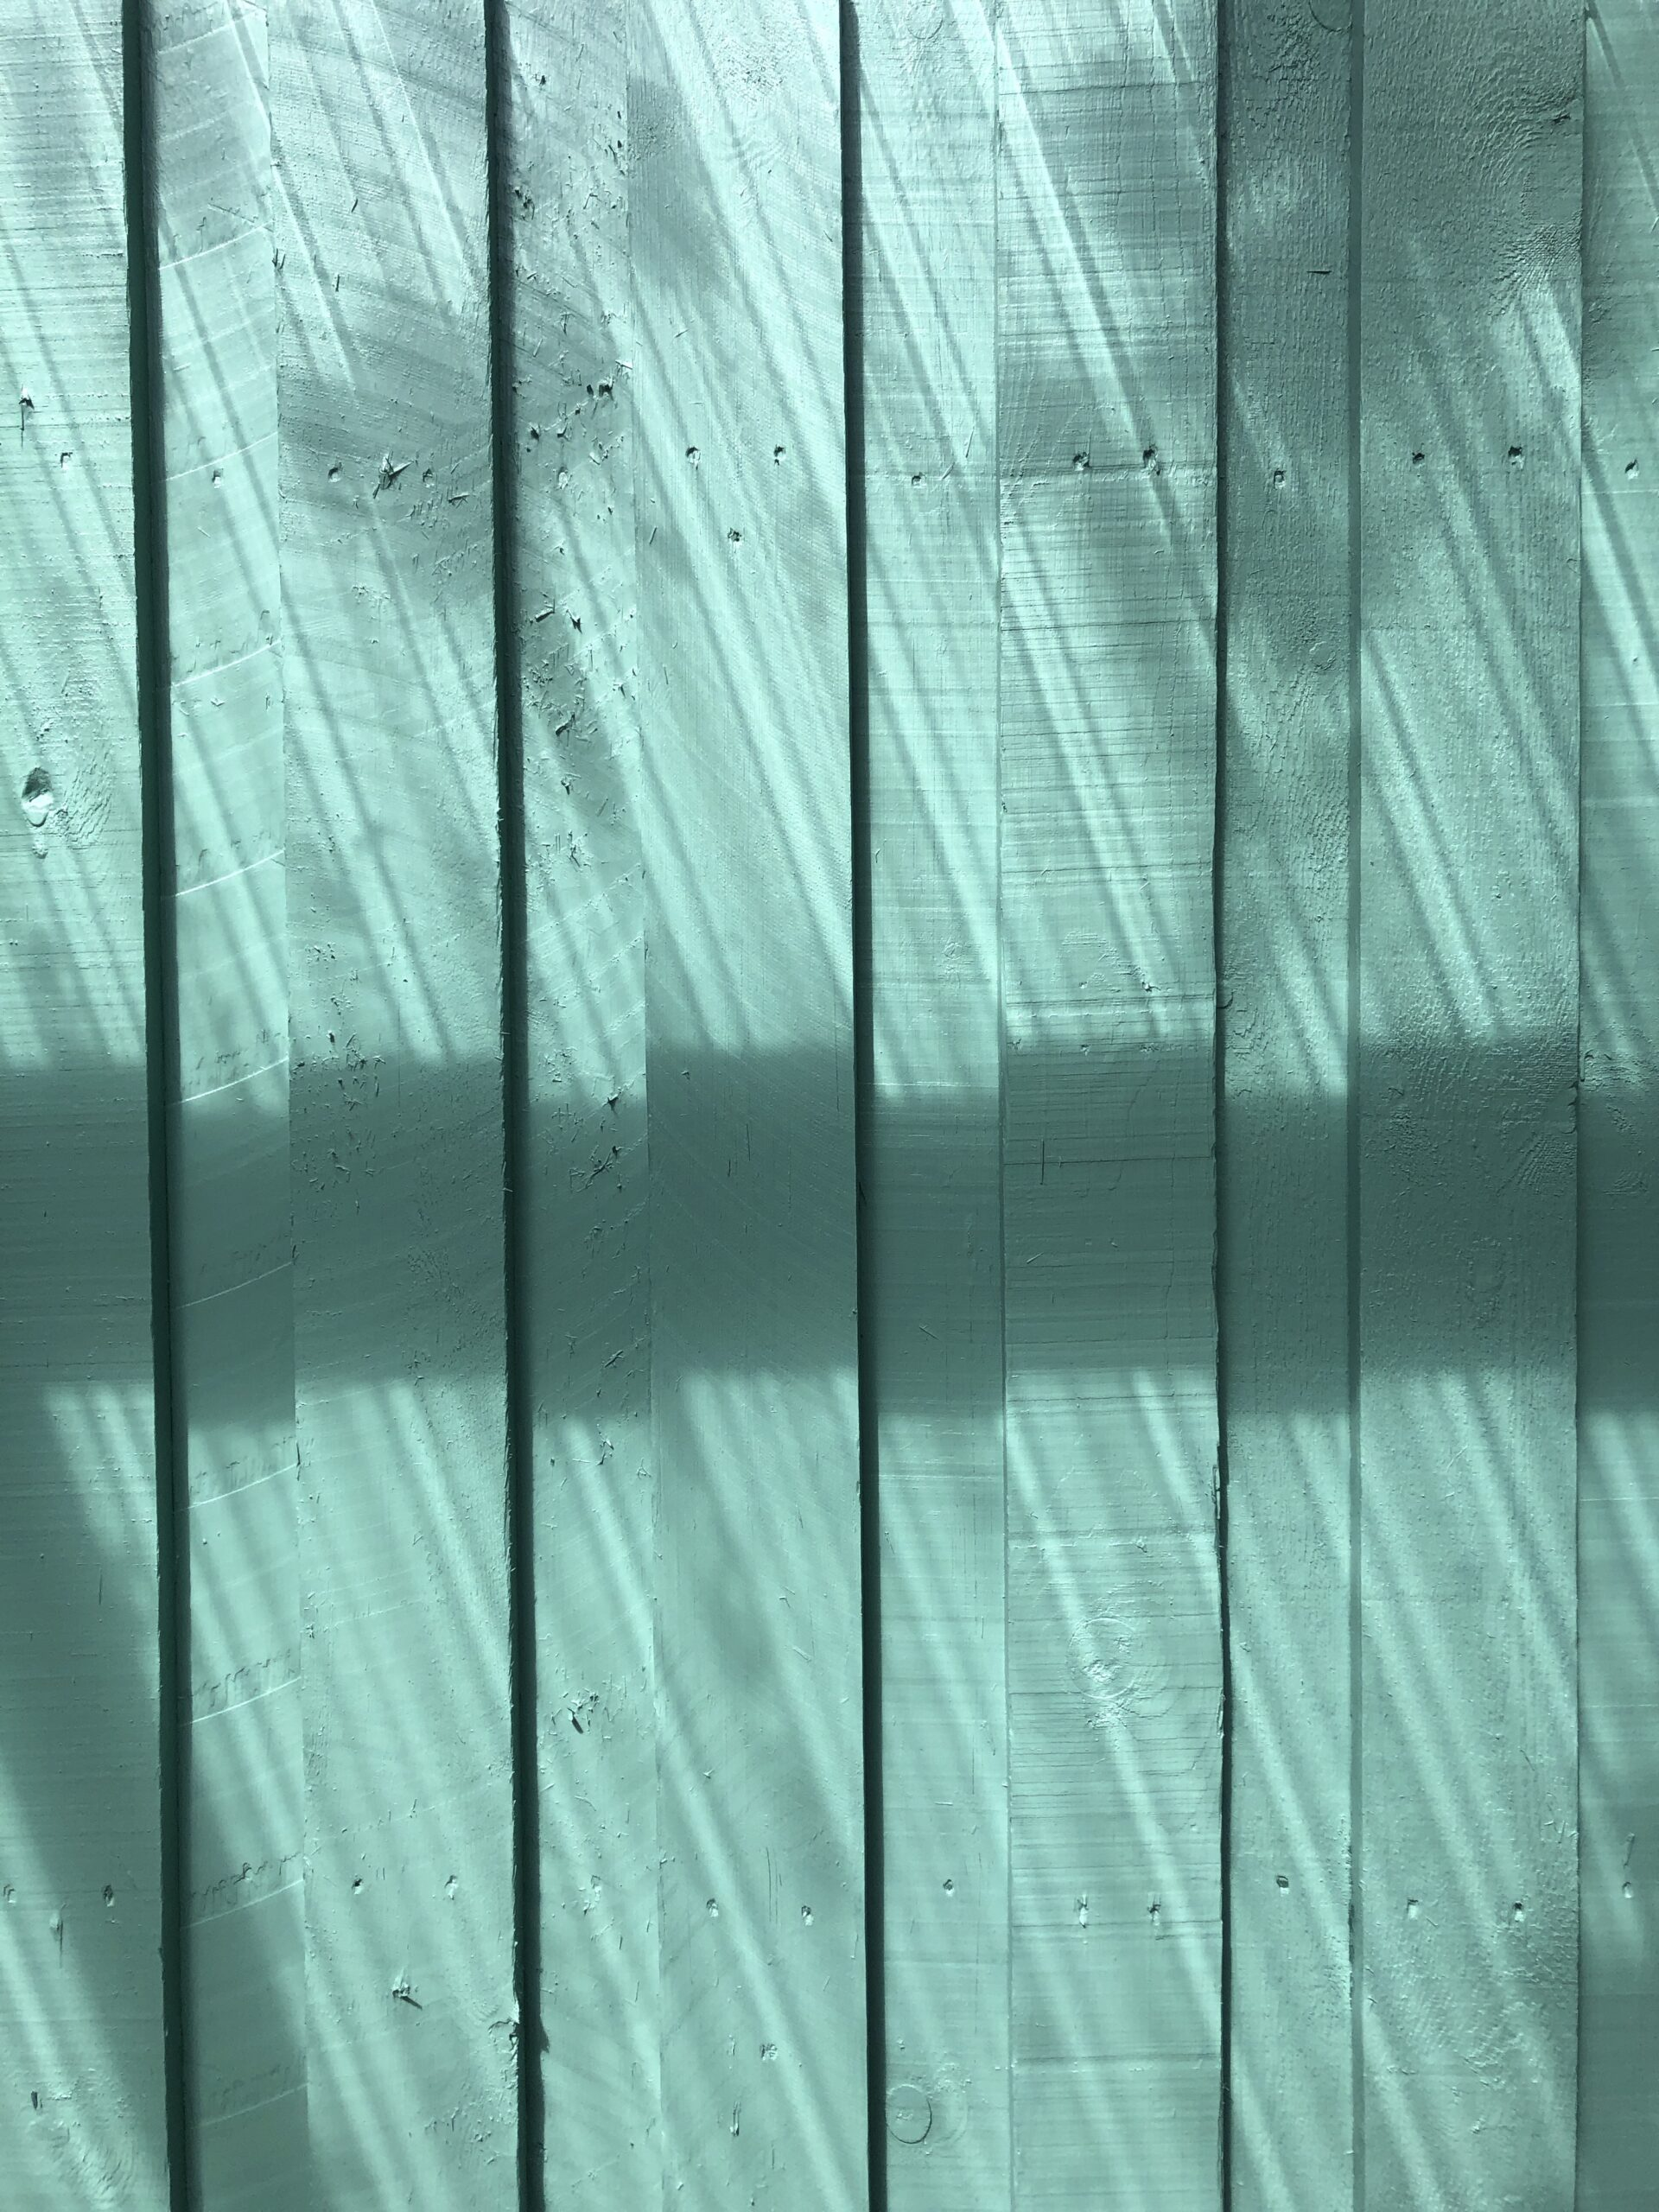 Bertelsen & Scheving - farver i arkitekturen